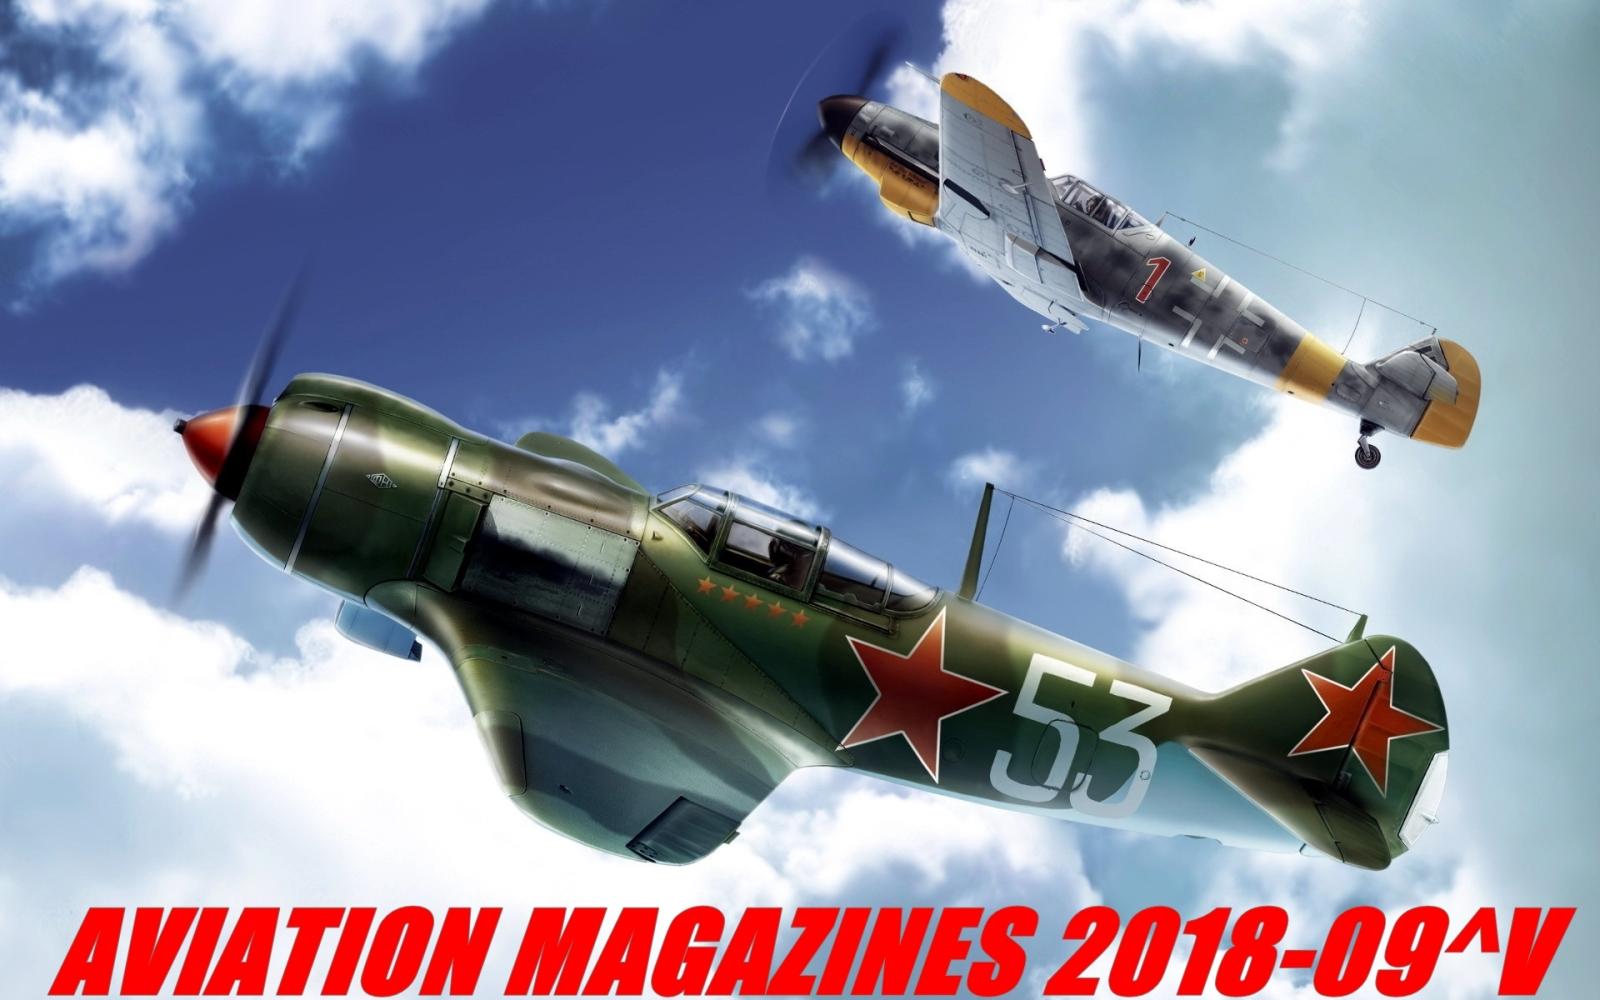 Aviation magazines 2018-09